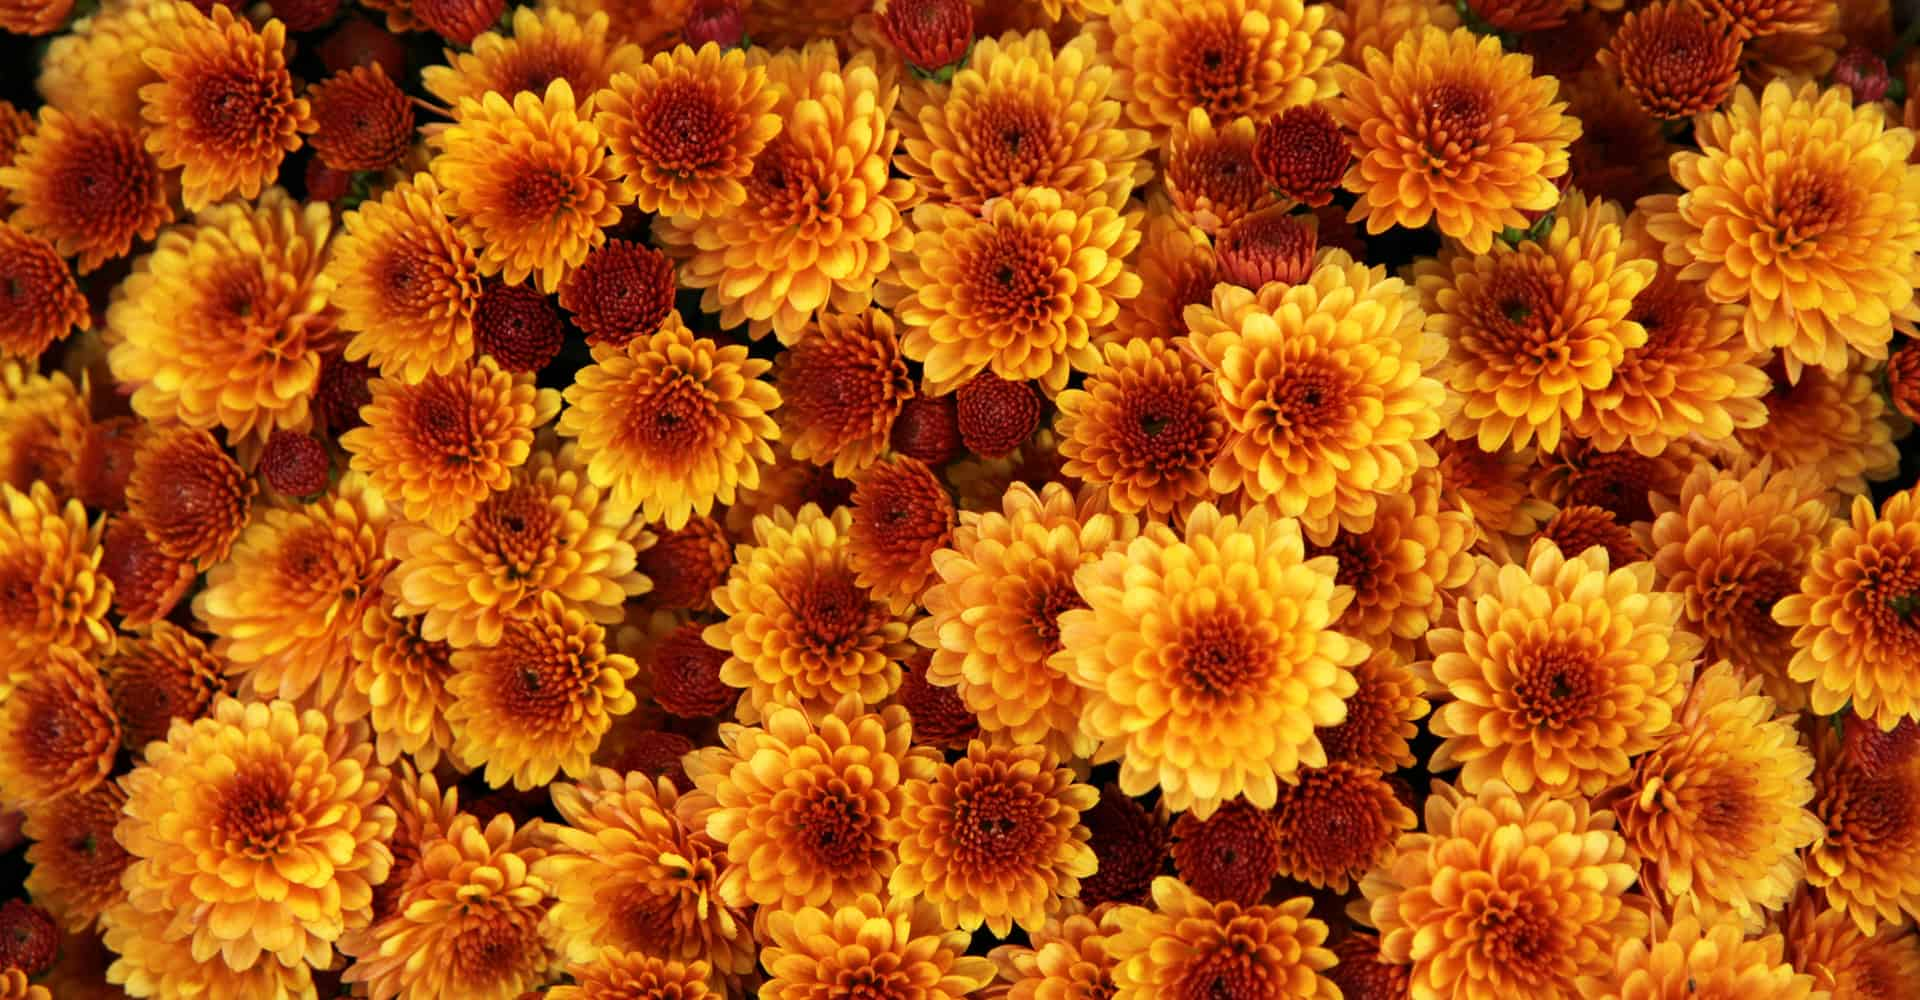 Chrysanthemum Care Guide How To Grow Chrysanthemum Diy